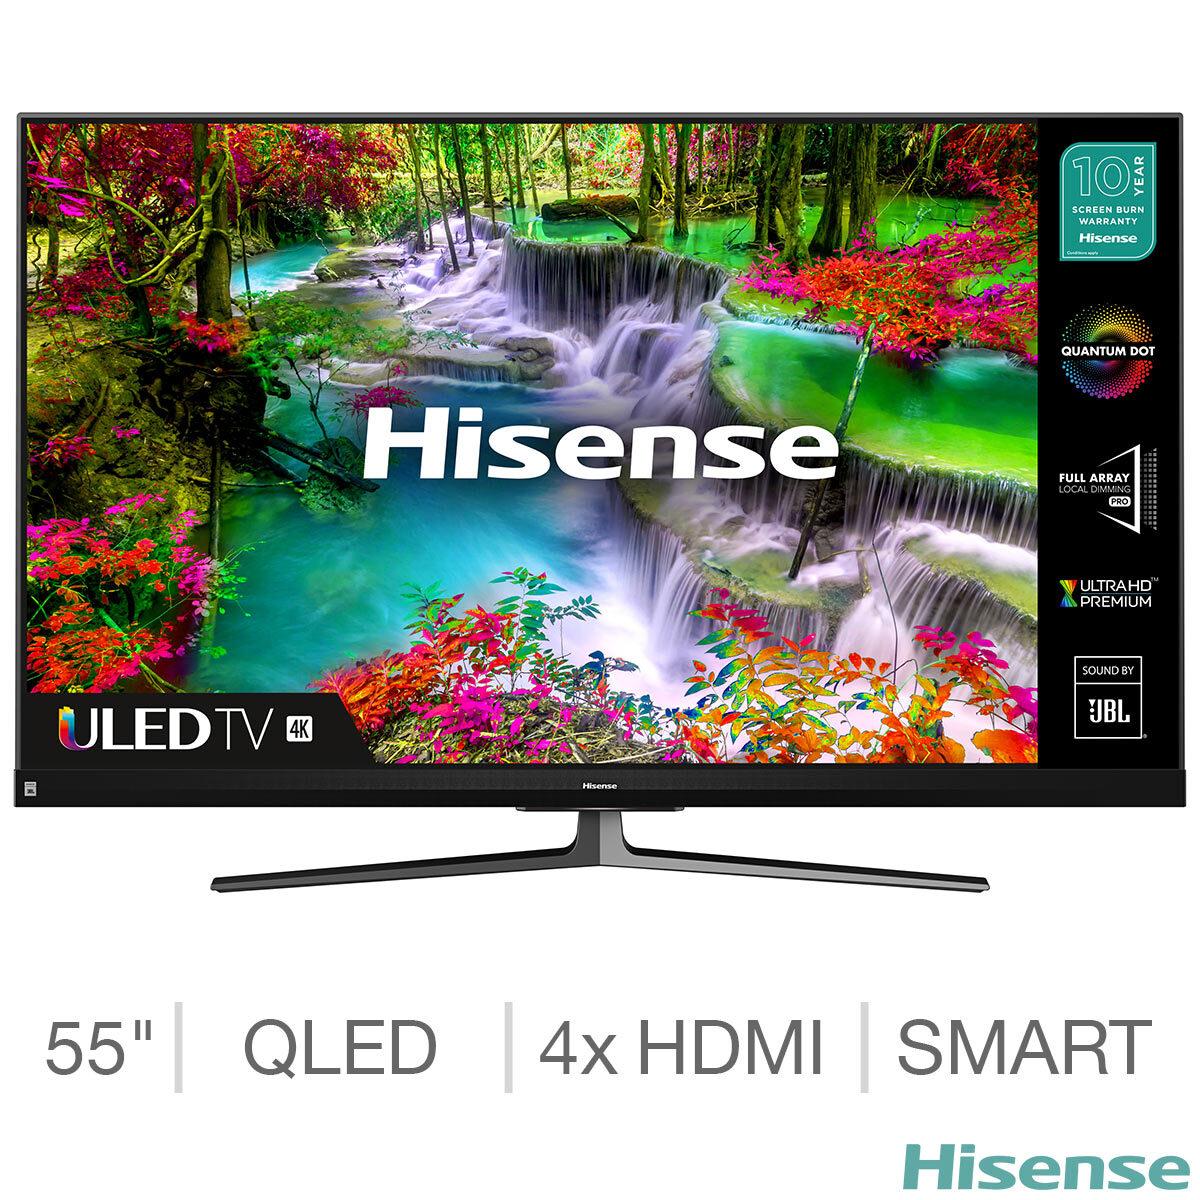 Hisense 55U8QFTUK 55 Inch QLED 4K Ultra HD Smart TV + 5 year warranty - £499 delivered (Membership Required) @ Costco